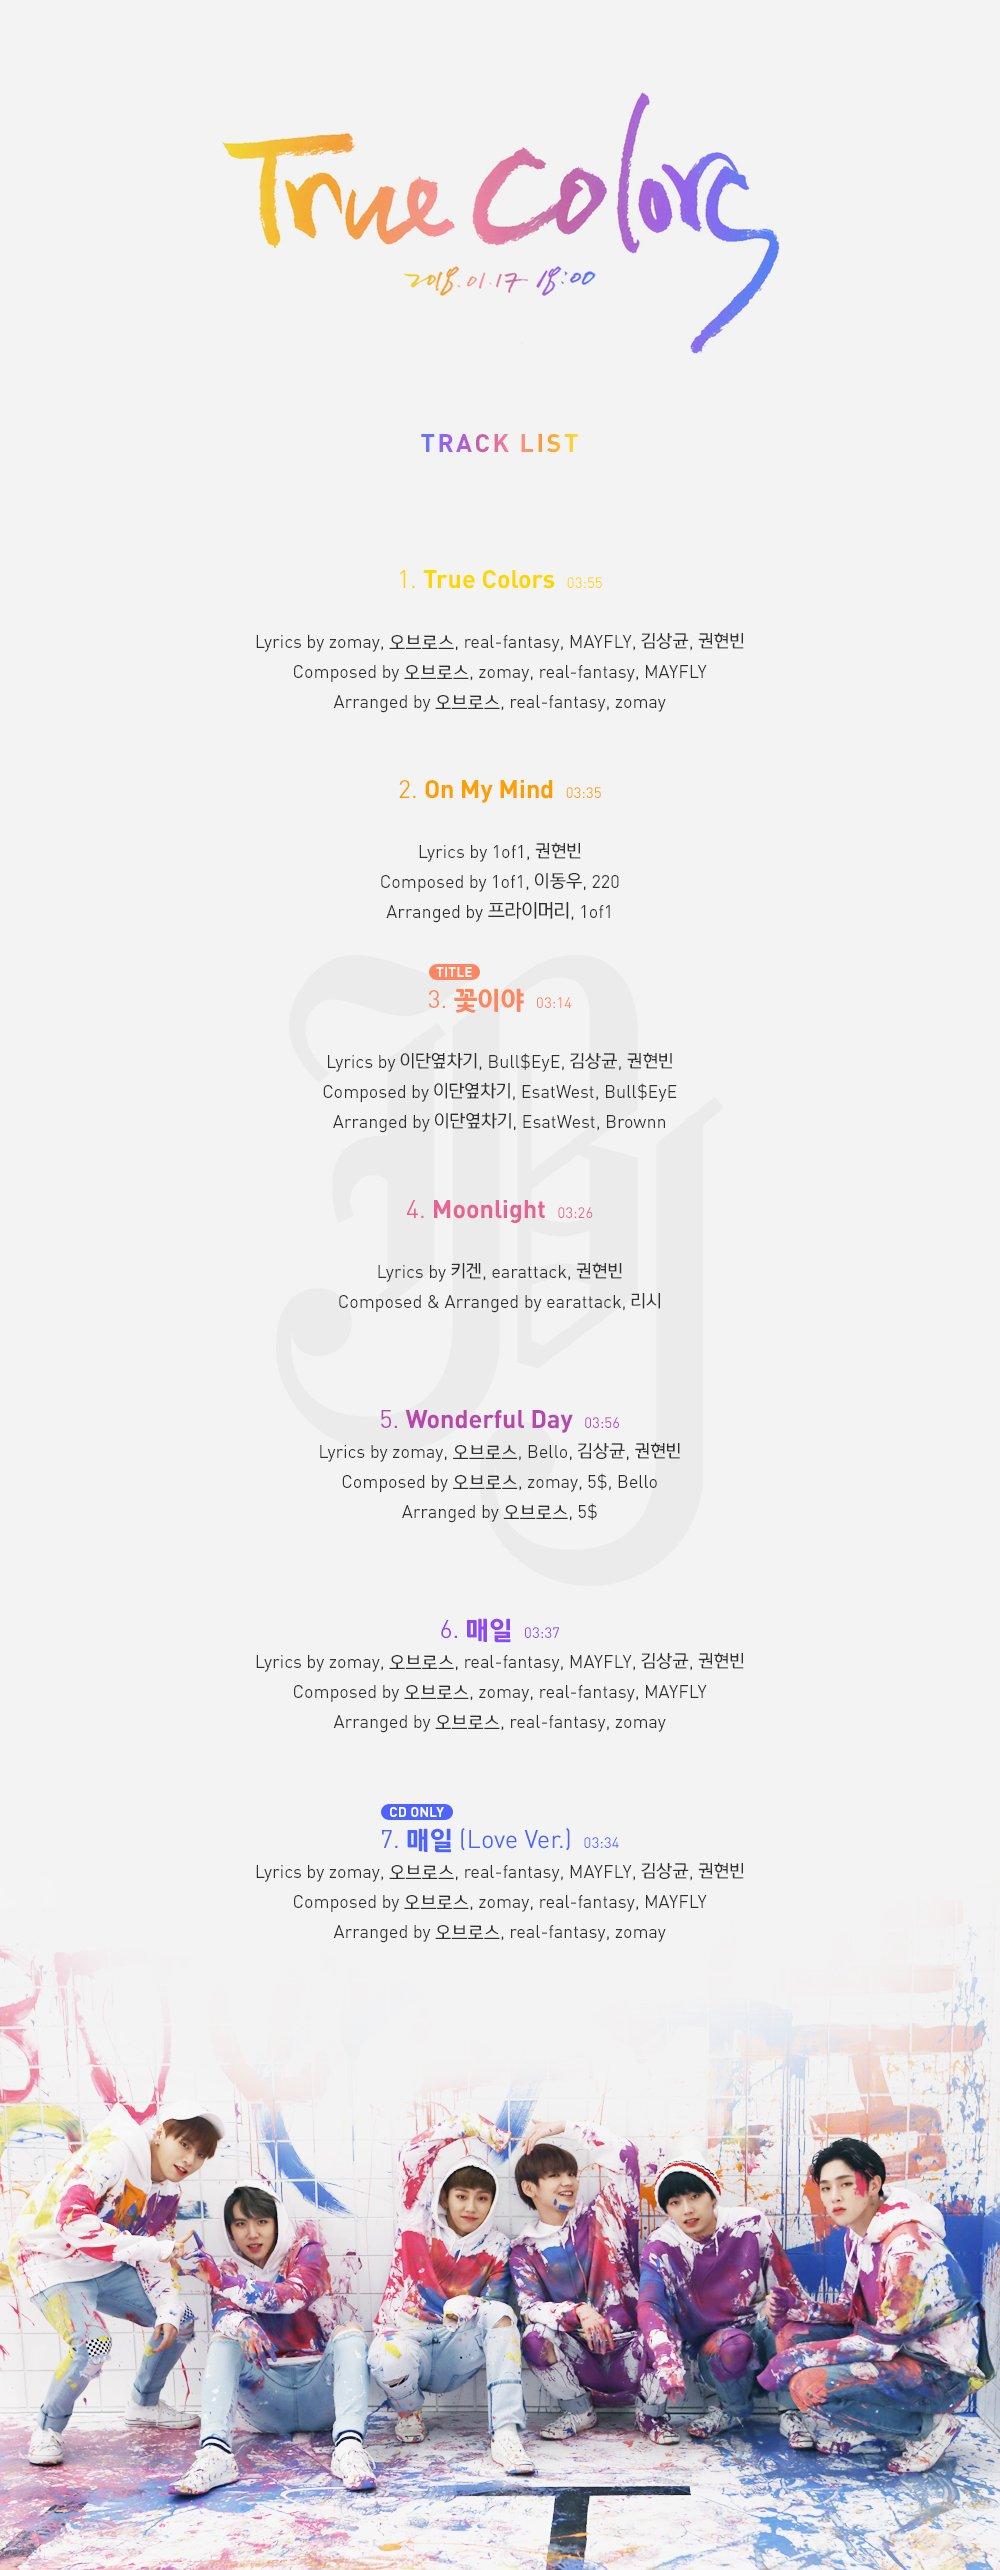 Daftar lagu dalam mini album